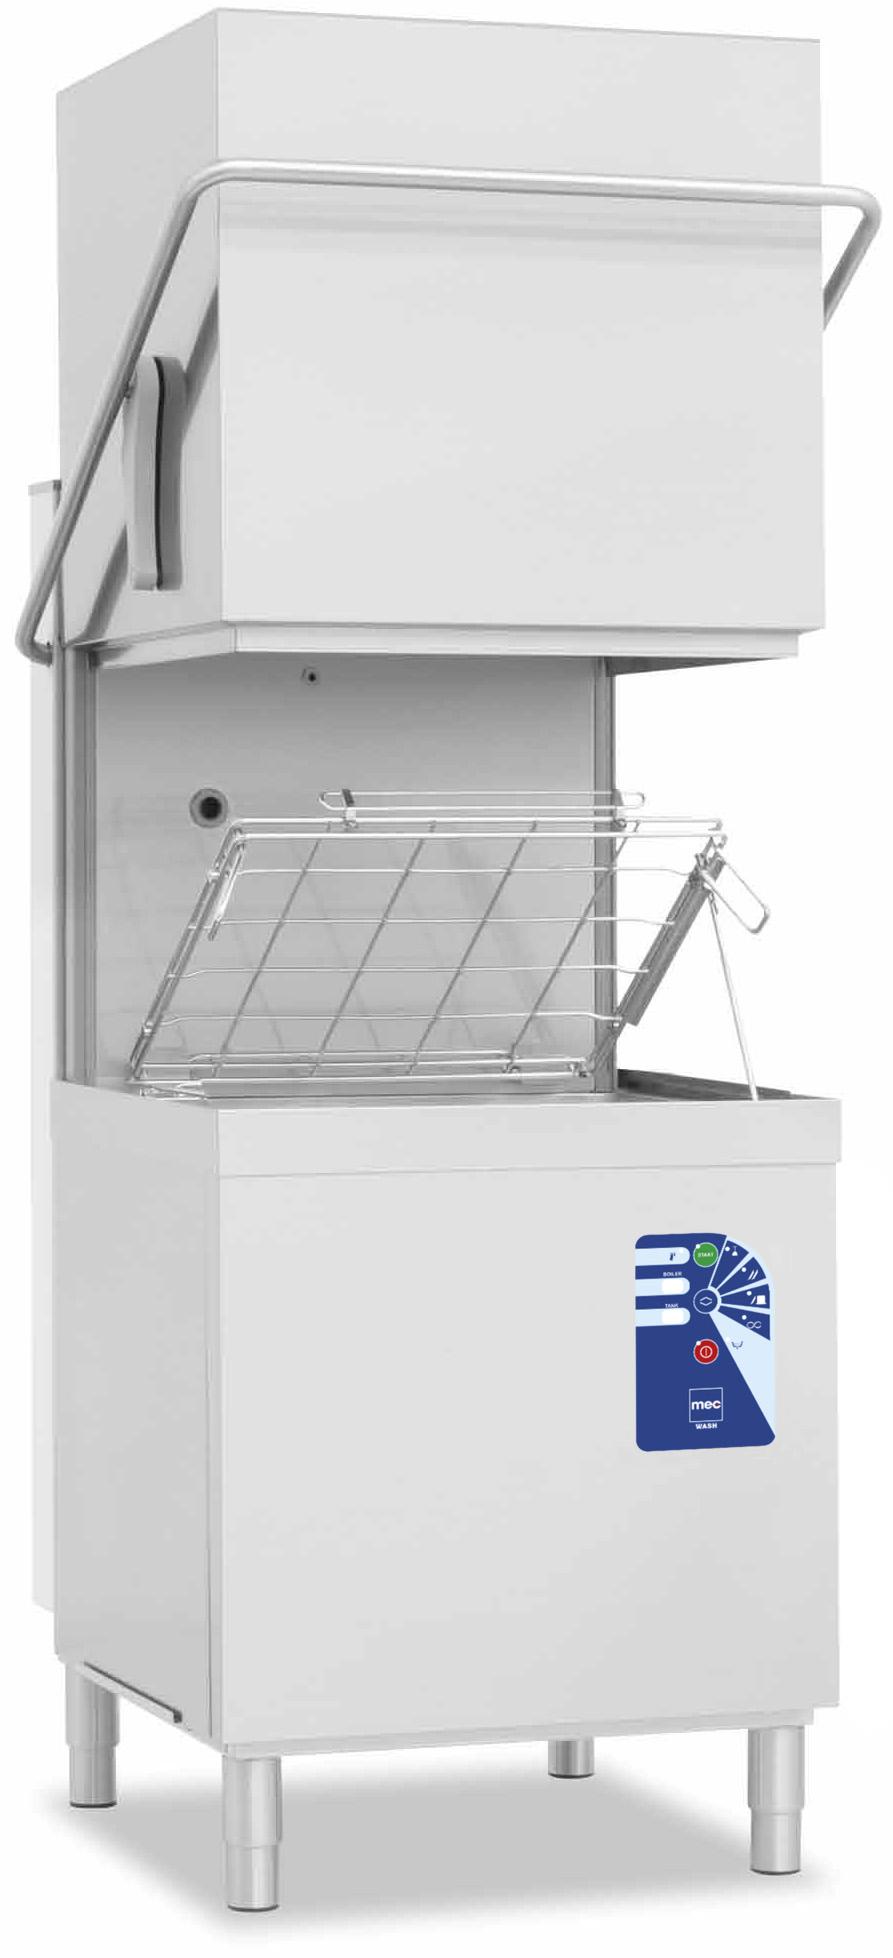 Màquina de Lavar louça de Cupula T1515